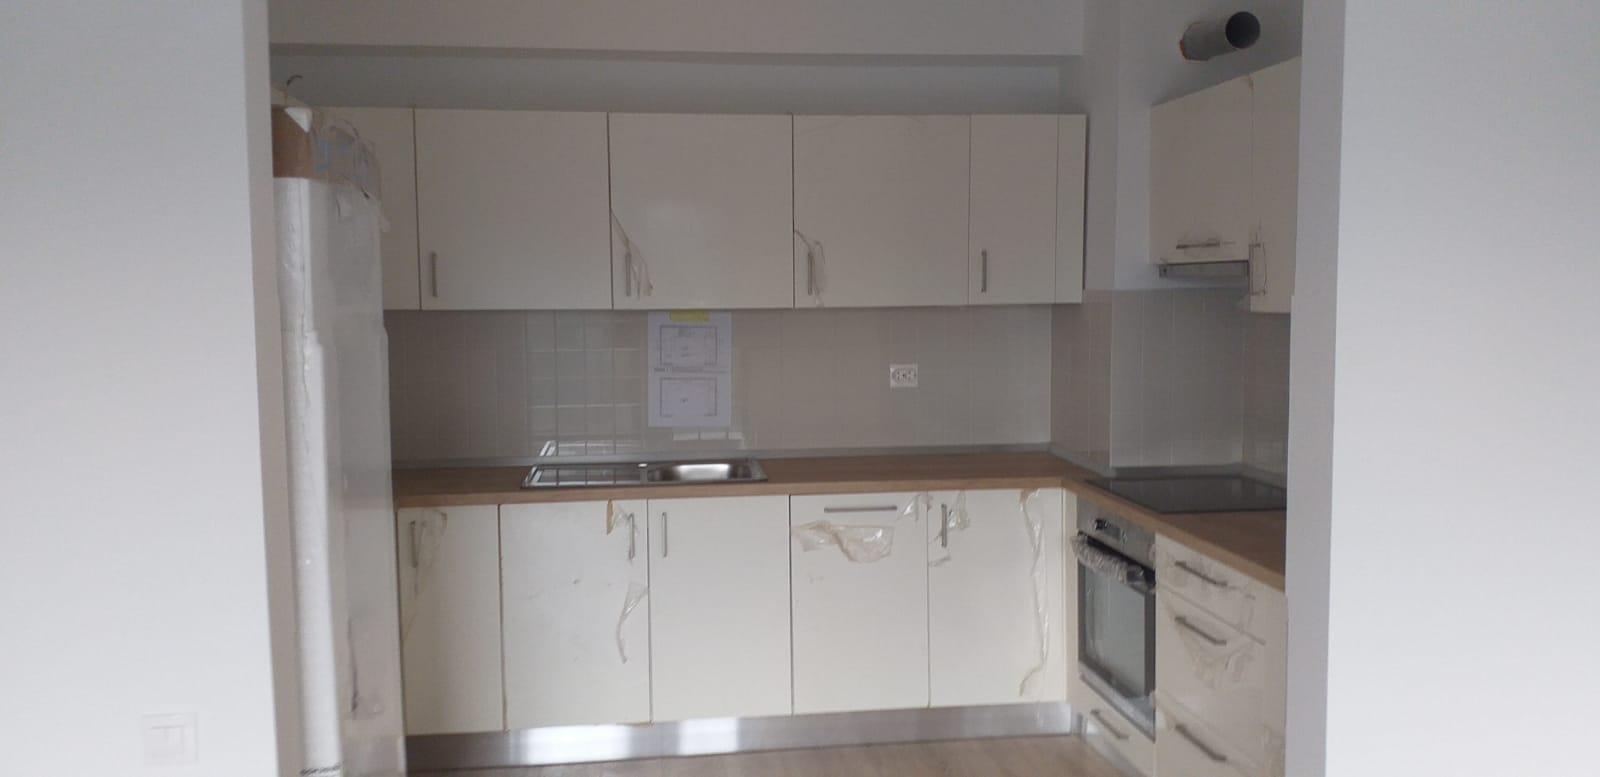 182293-Vanzare apartament 2 camere, Gheorgheni, Cluj-Napoca